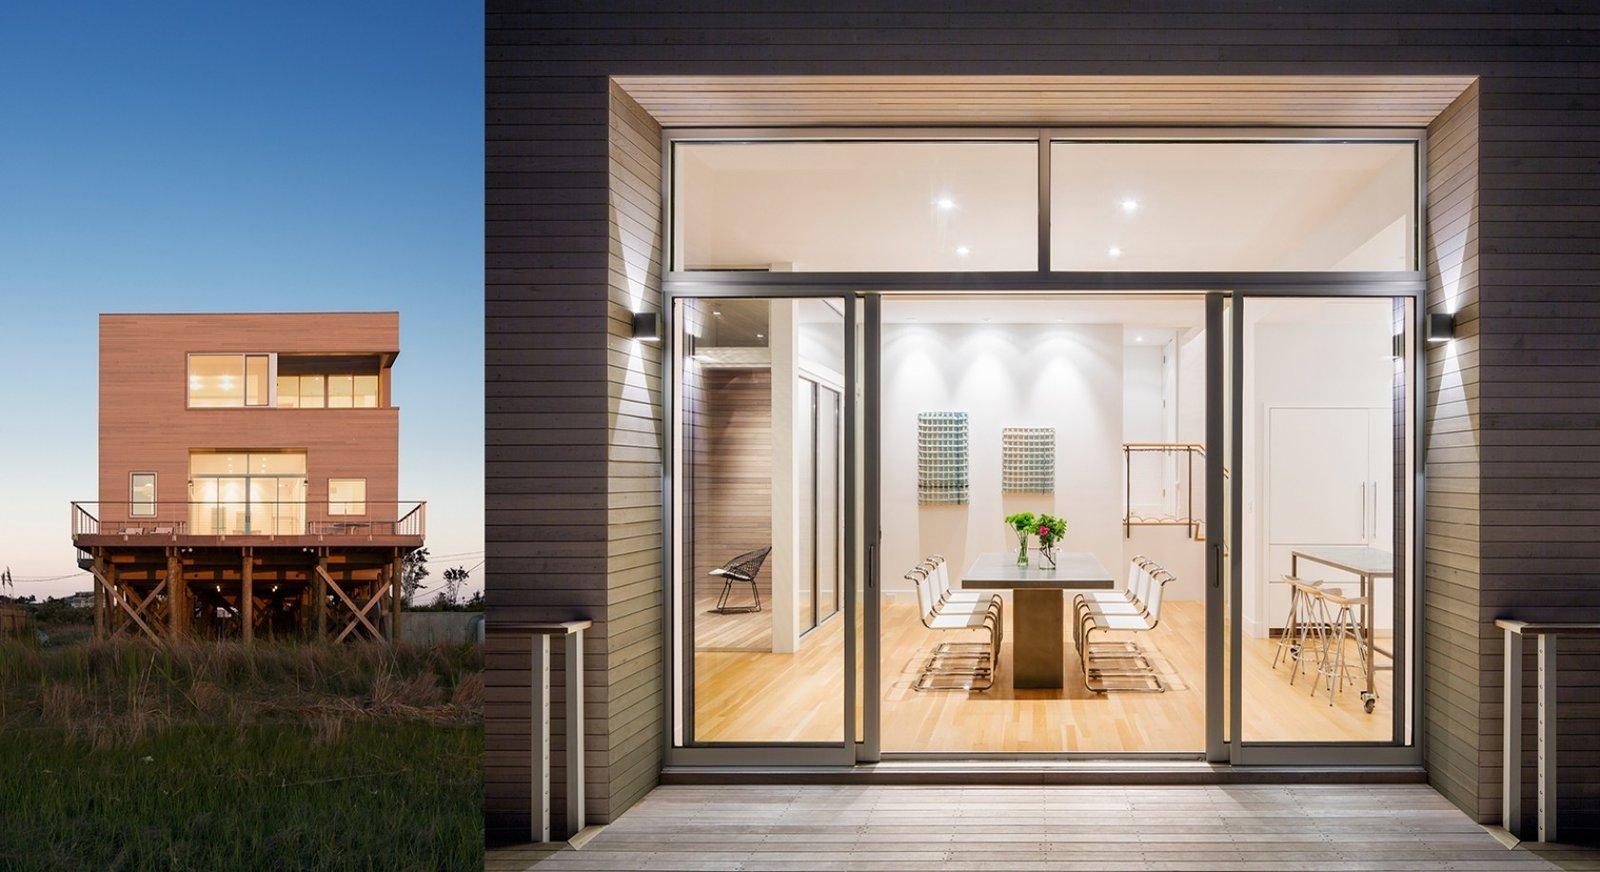 #CubeHouse #interior #exterior #wood #panels #deck #table #chairs #dining #seating #lighting #doors #modern #midcentury #Westhamptonbeach #NewYork #LeroyStreetStudio   Cube House